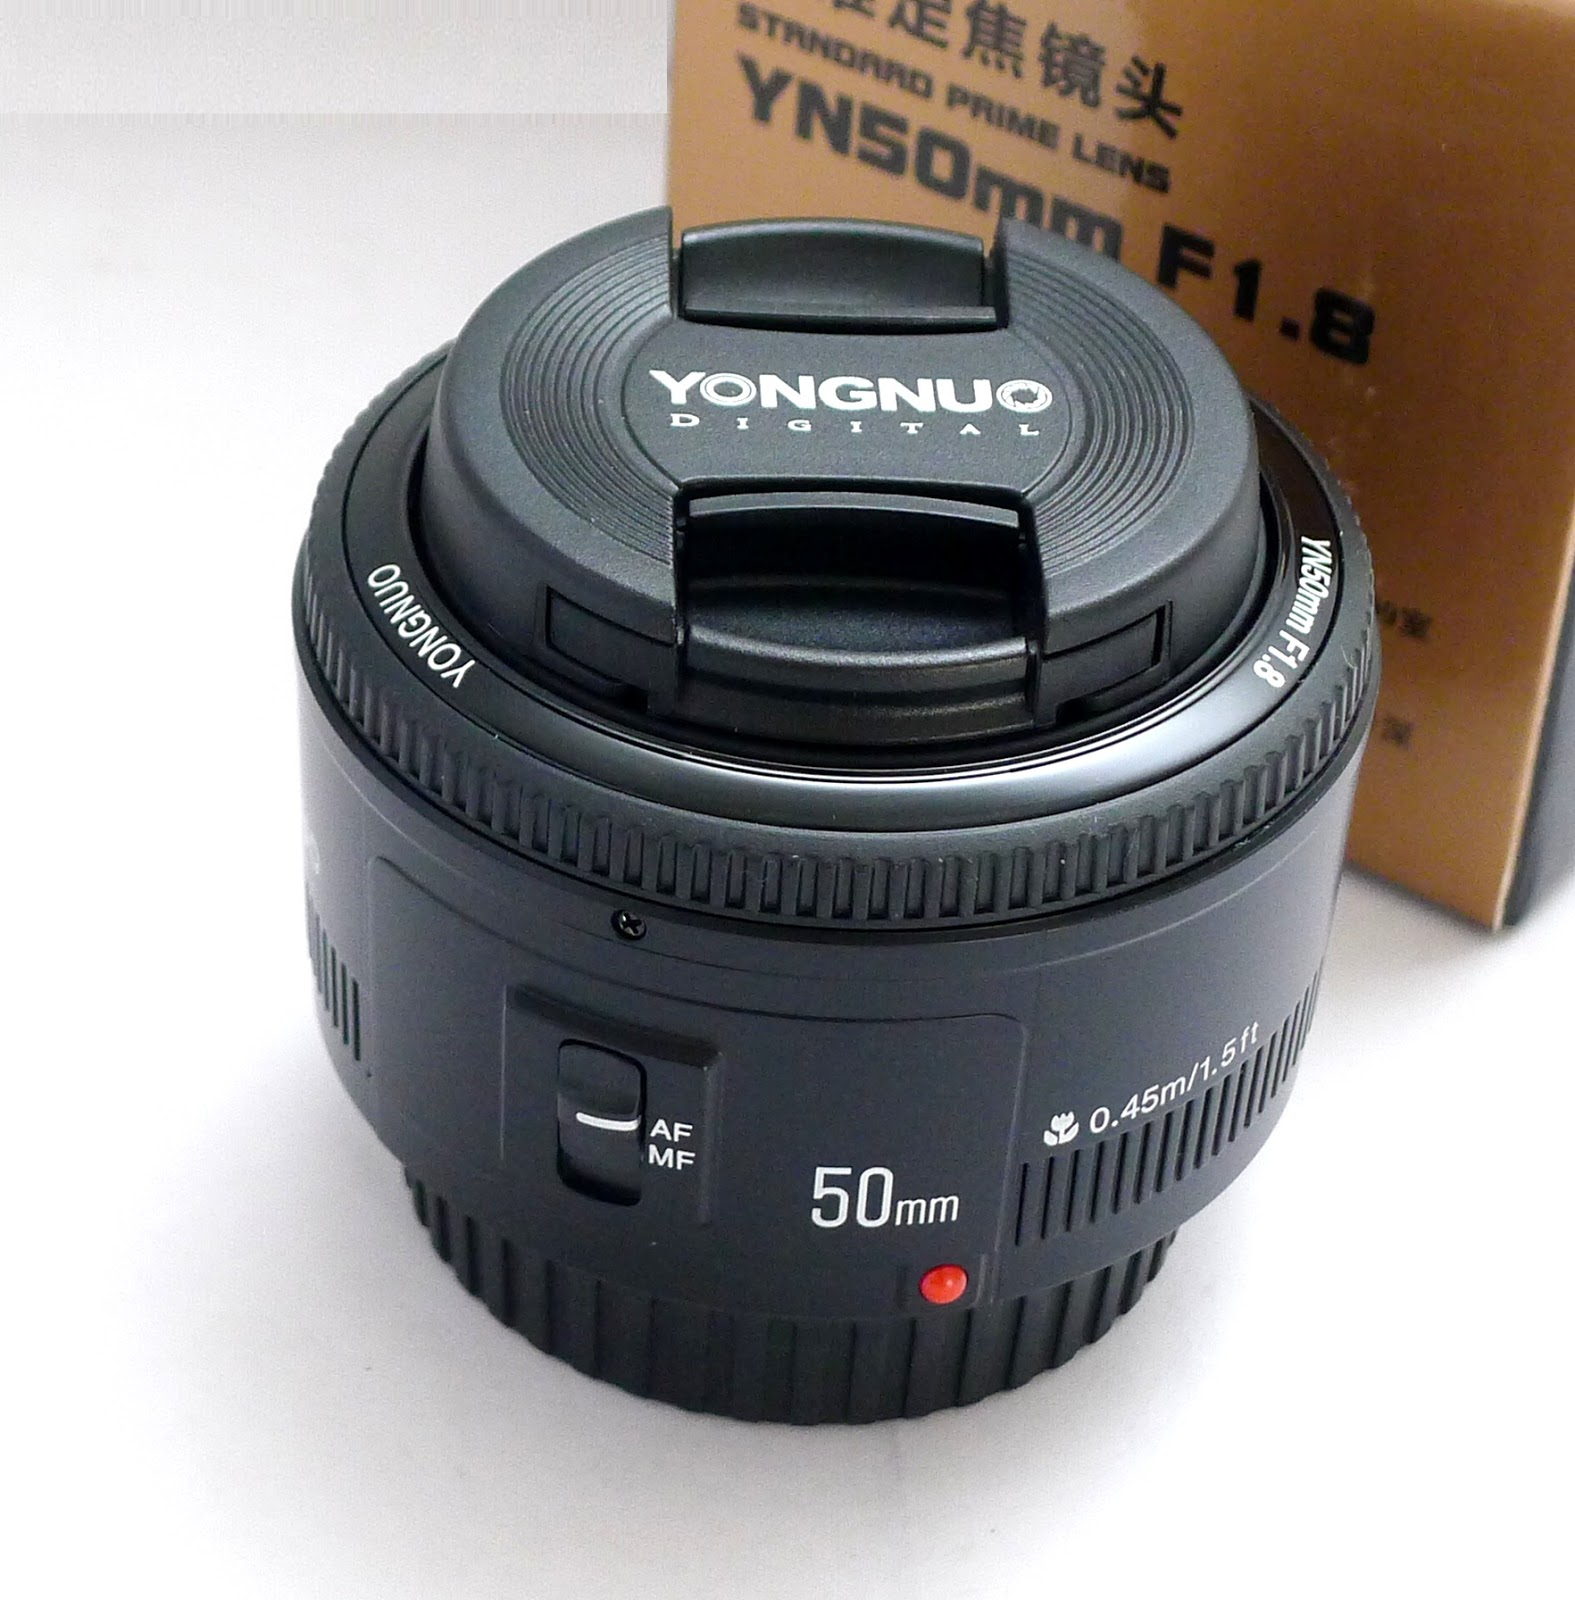 Lensa Fix Yongnuo Yn 50mm F18 Afs For Nikon Update Daftar Harga Bokeh Jual